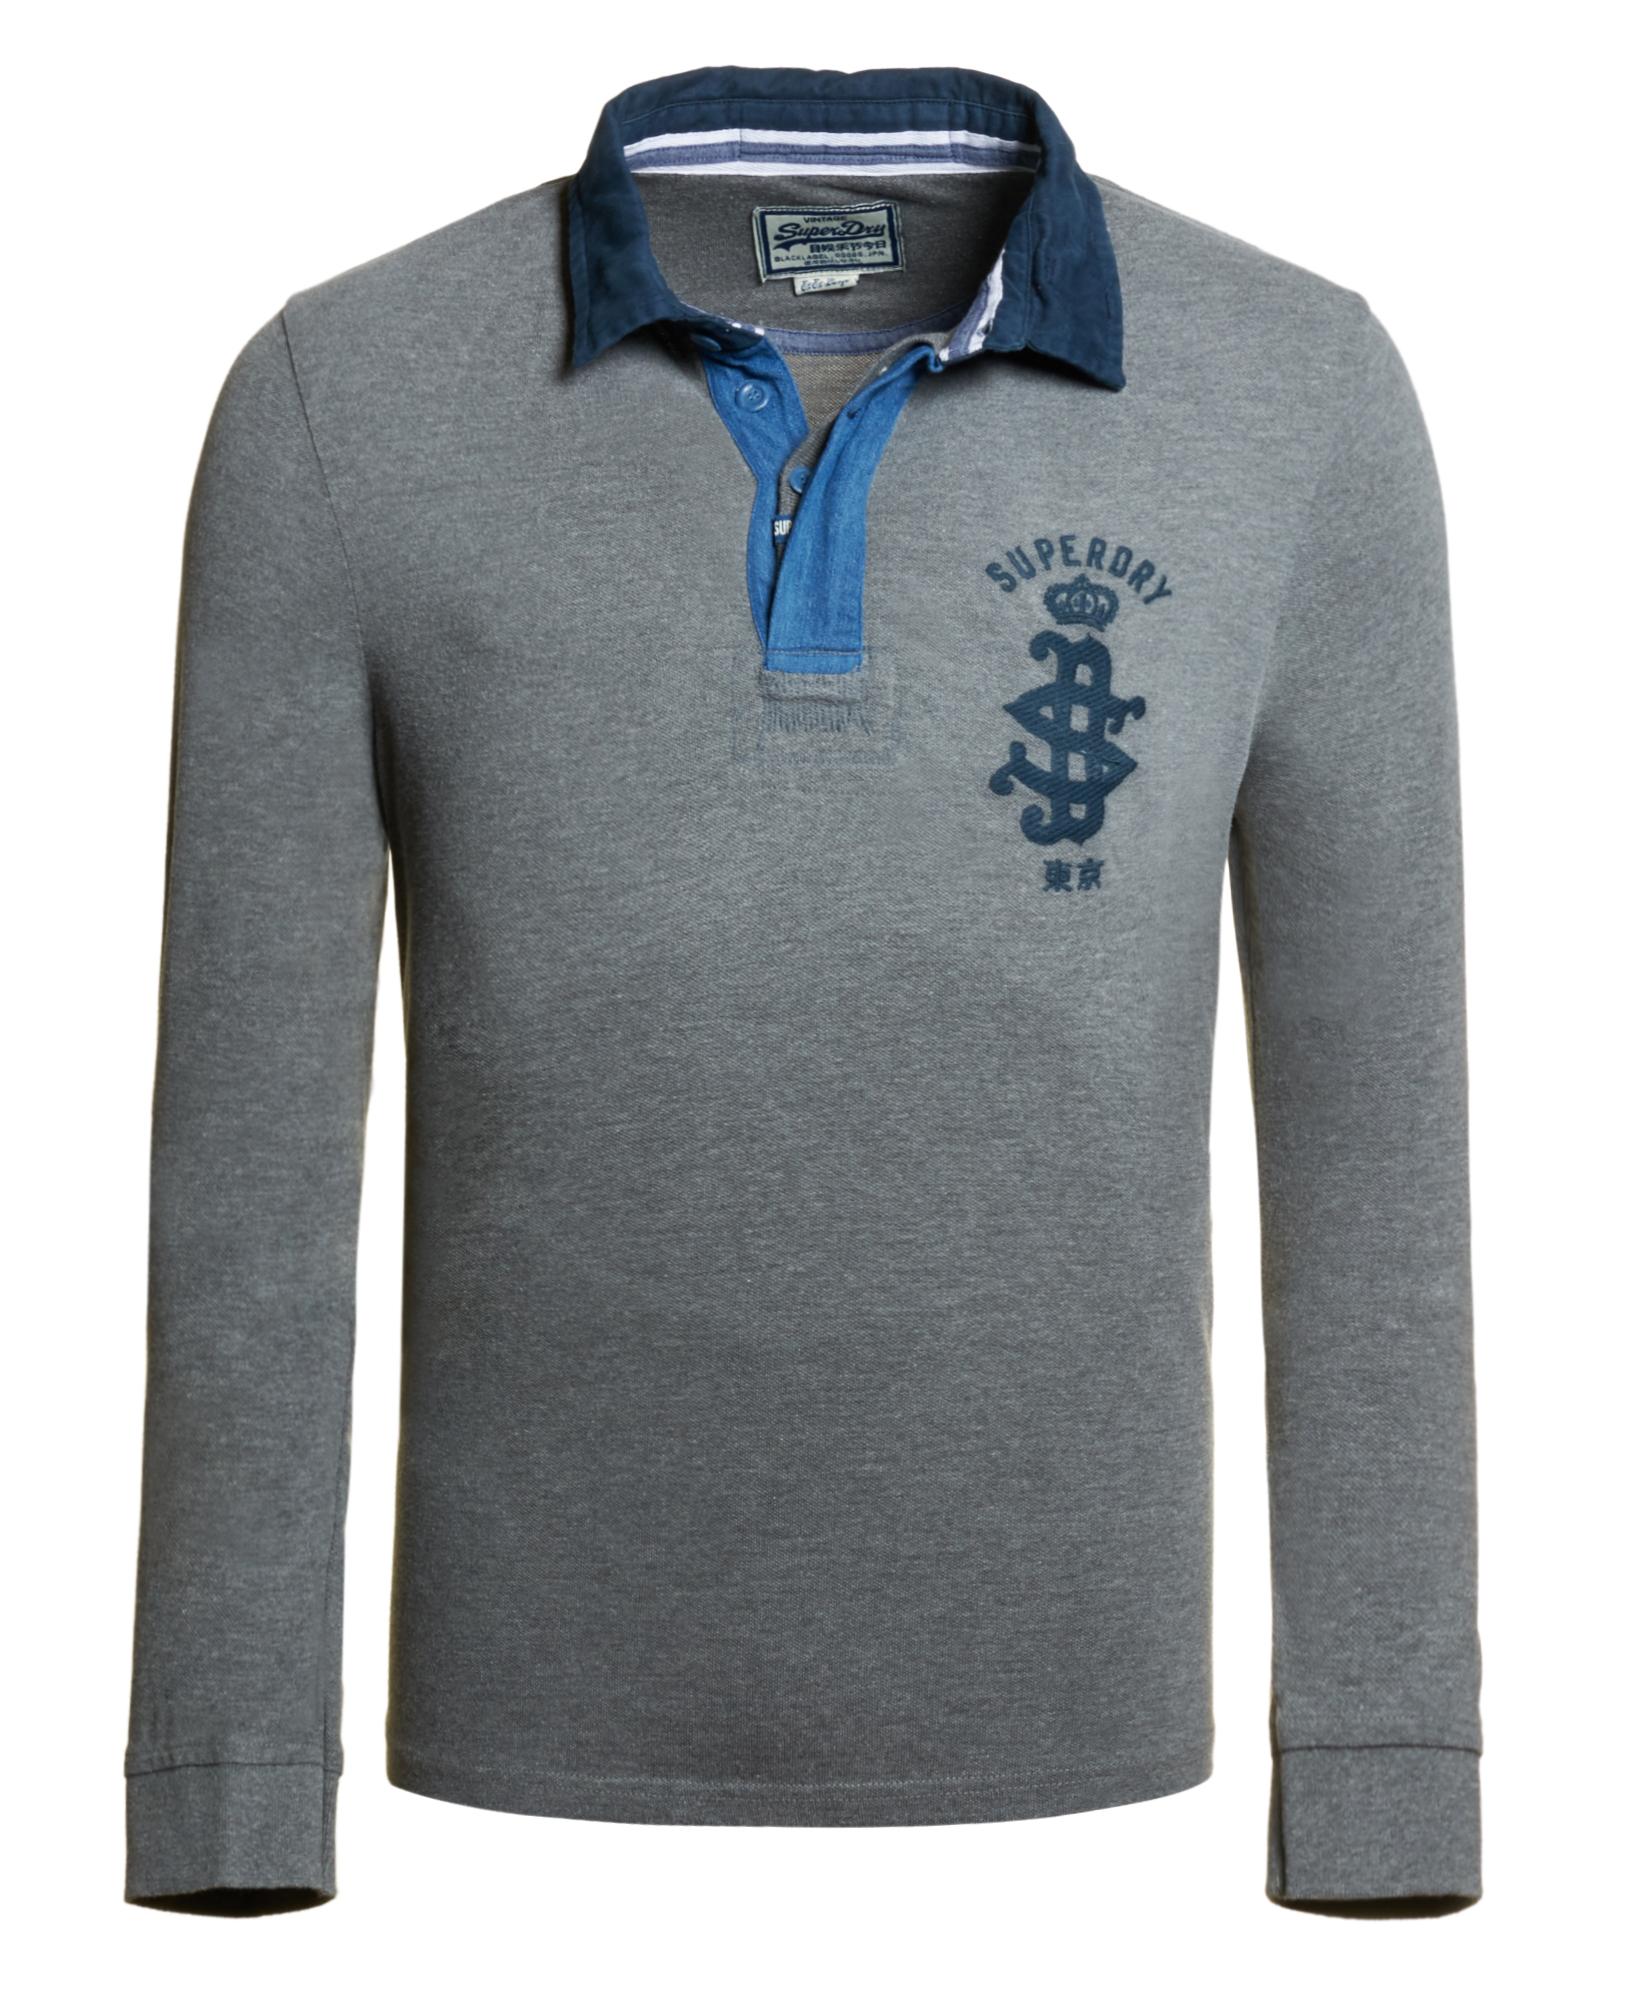 neues herren superdry blue collar polo shirt dark marl grau ebay. Black Bedroom Furniture Sets. Home Design Ideas